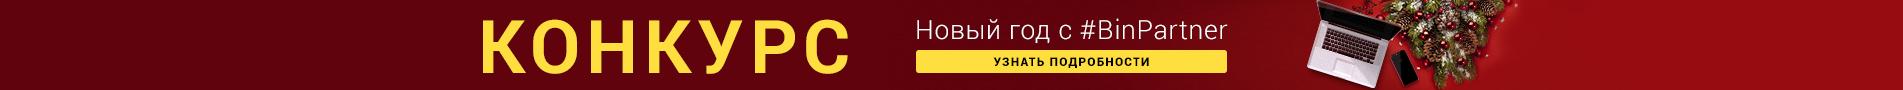 Top line for binpartner 1 ru